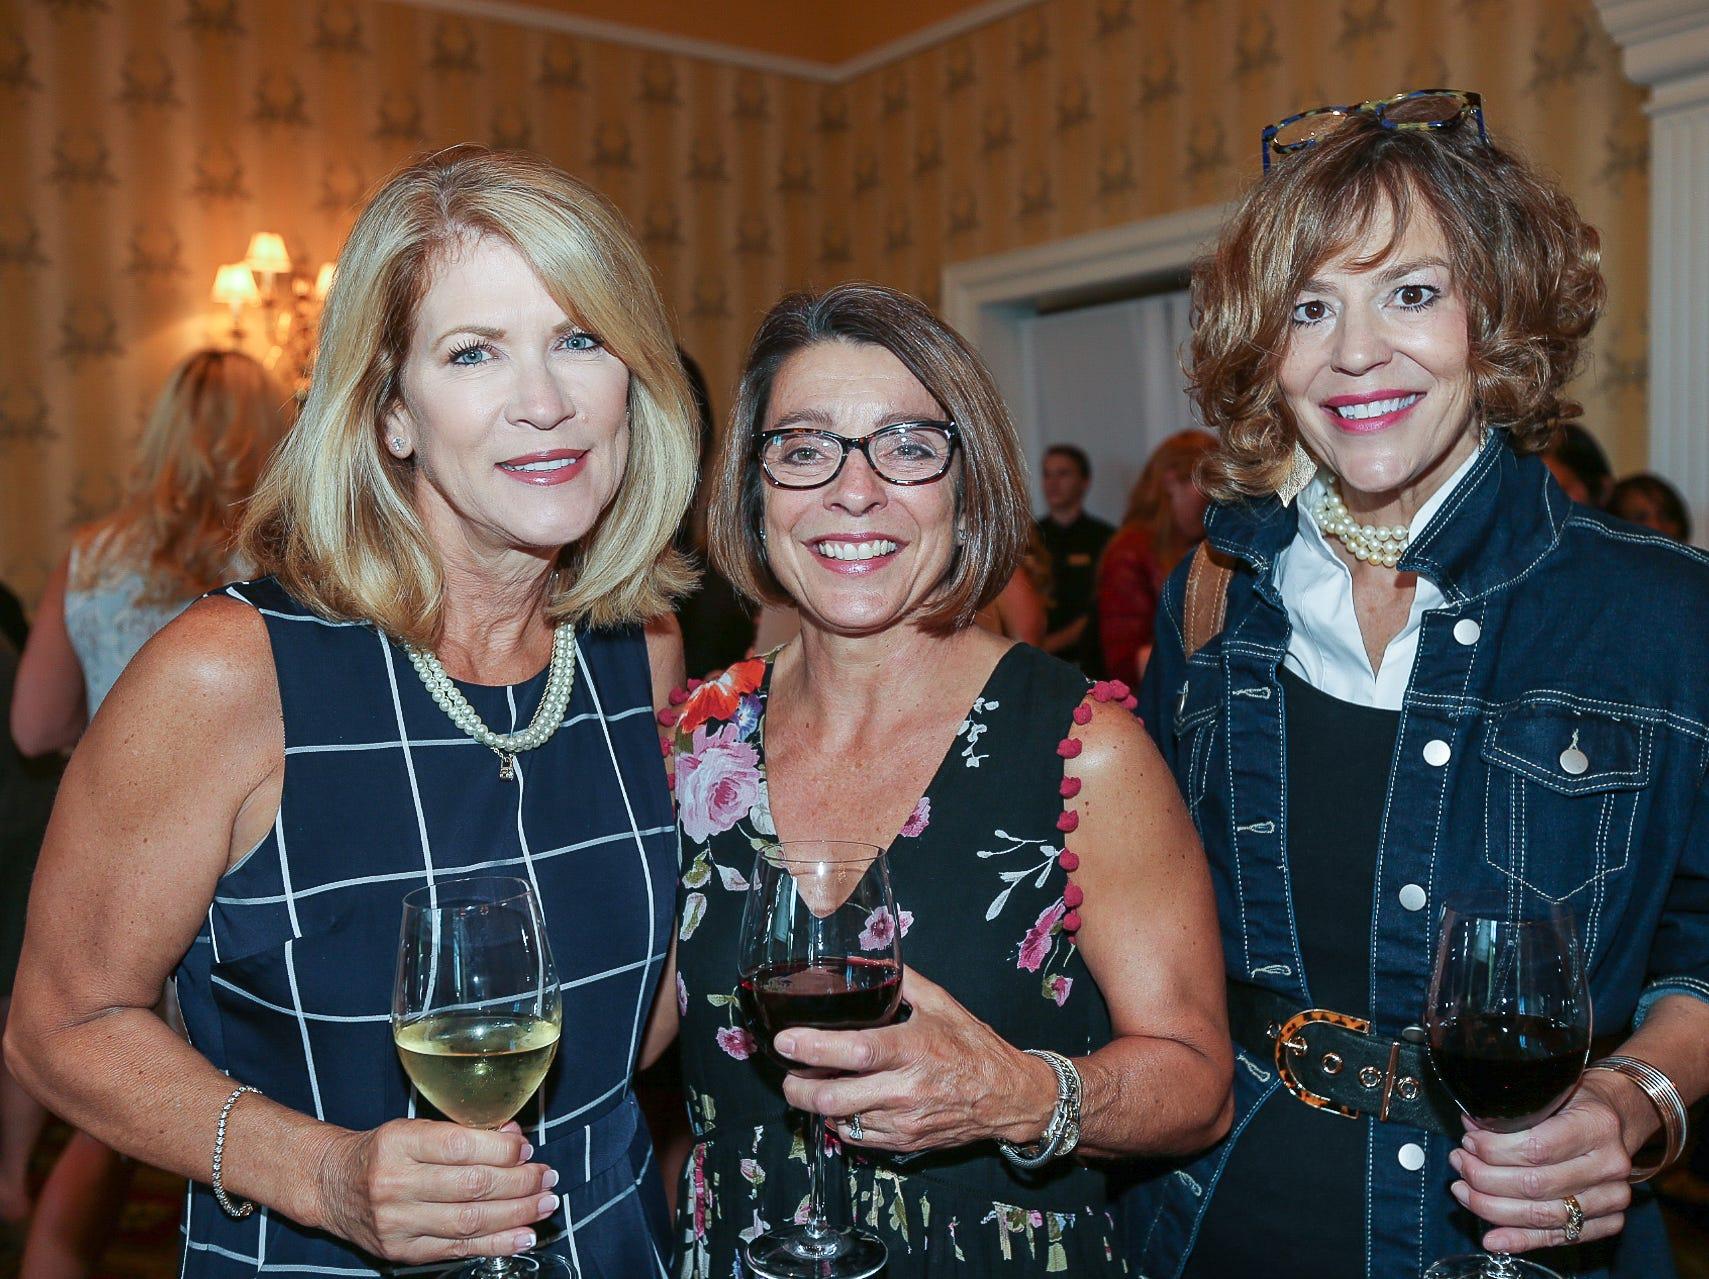 Kathy Hare, Gail Smart, and Susan Kirkman